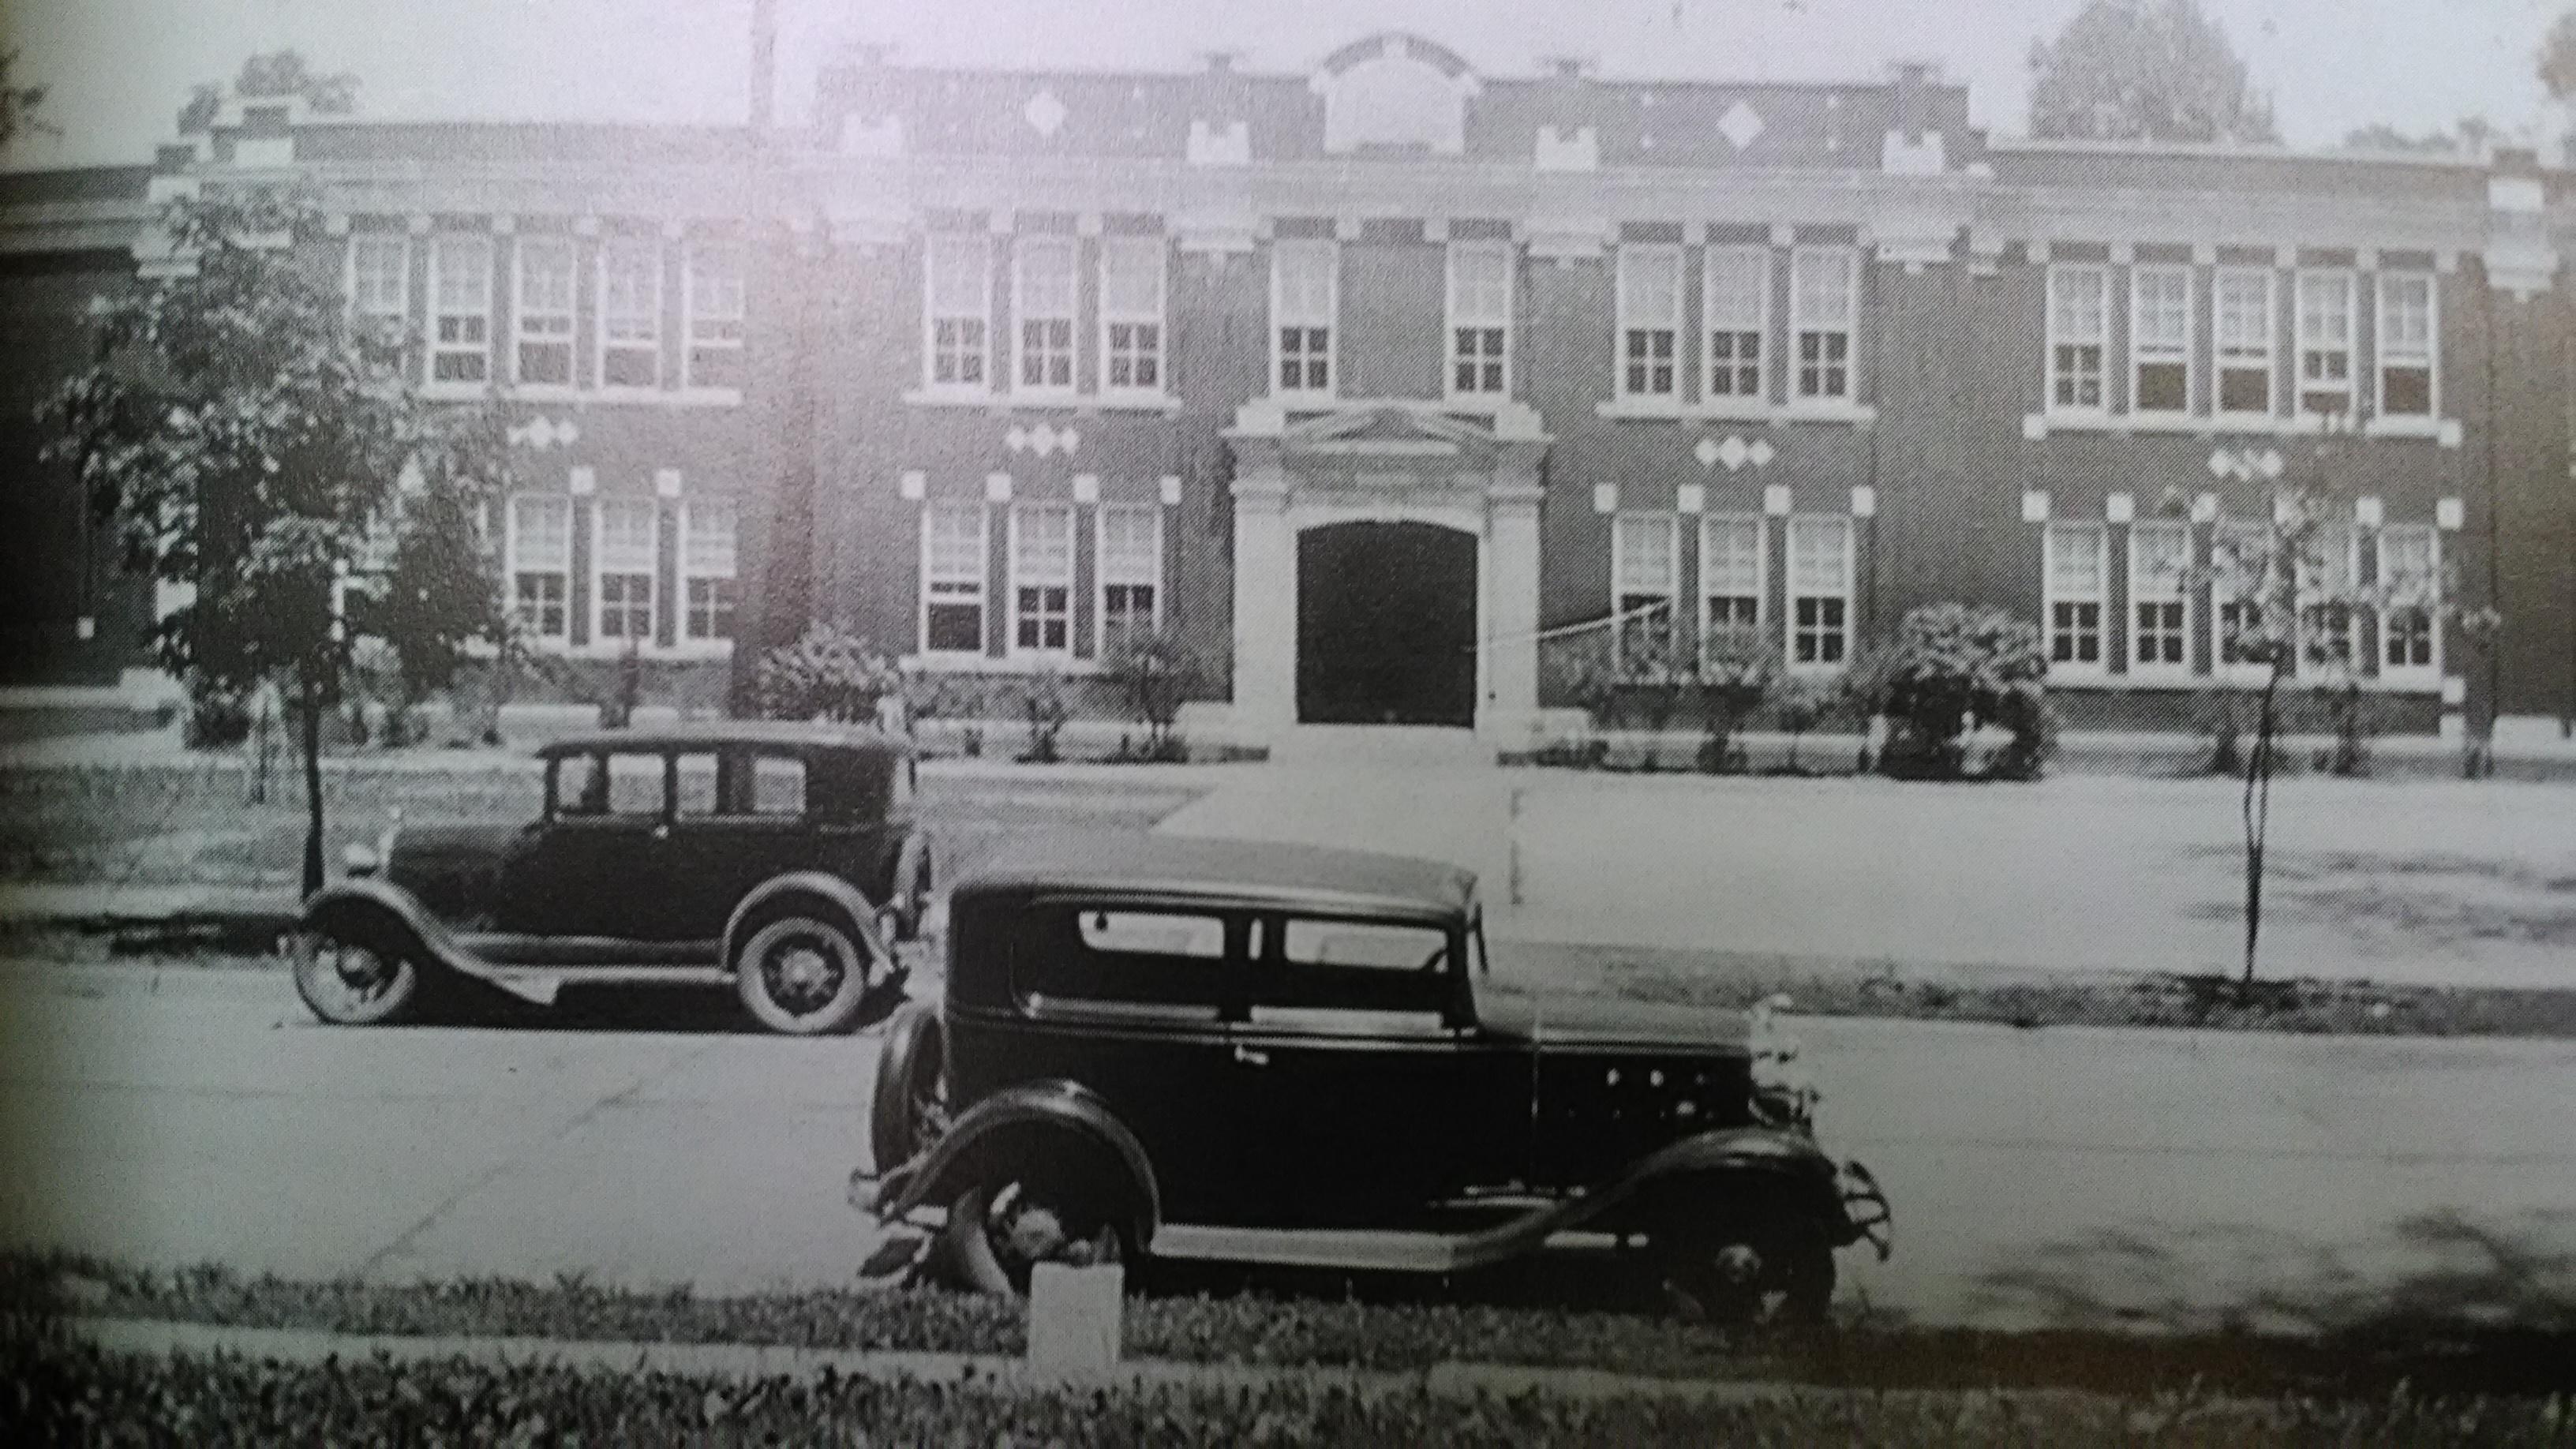 Hawthorne School on Central Avenue, c. 1922-23.